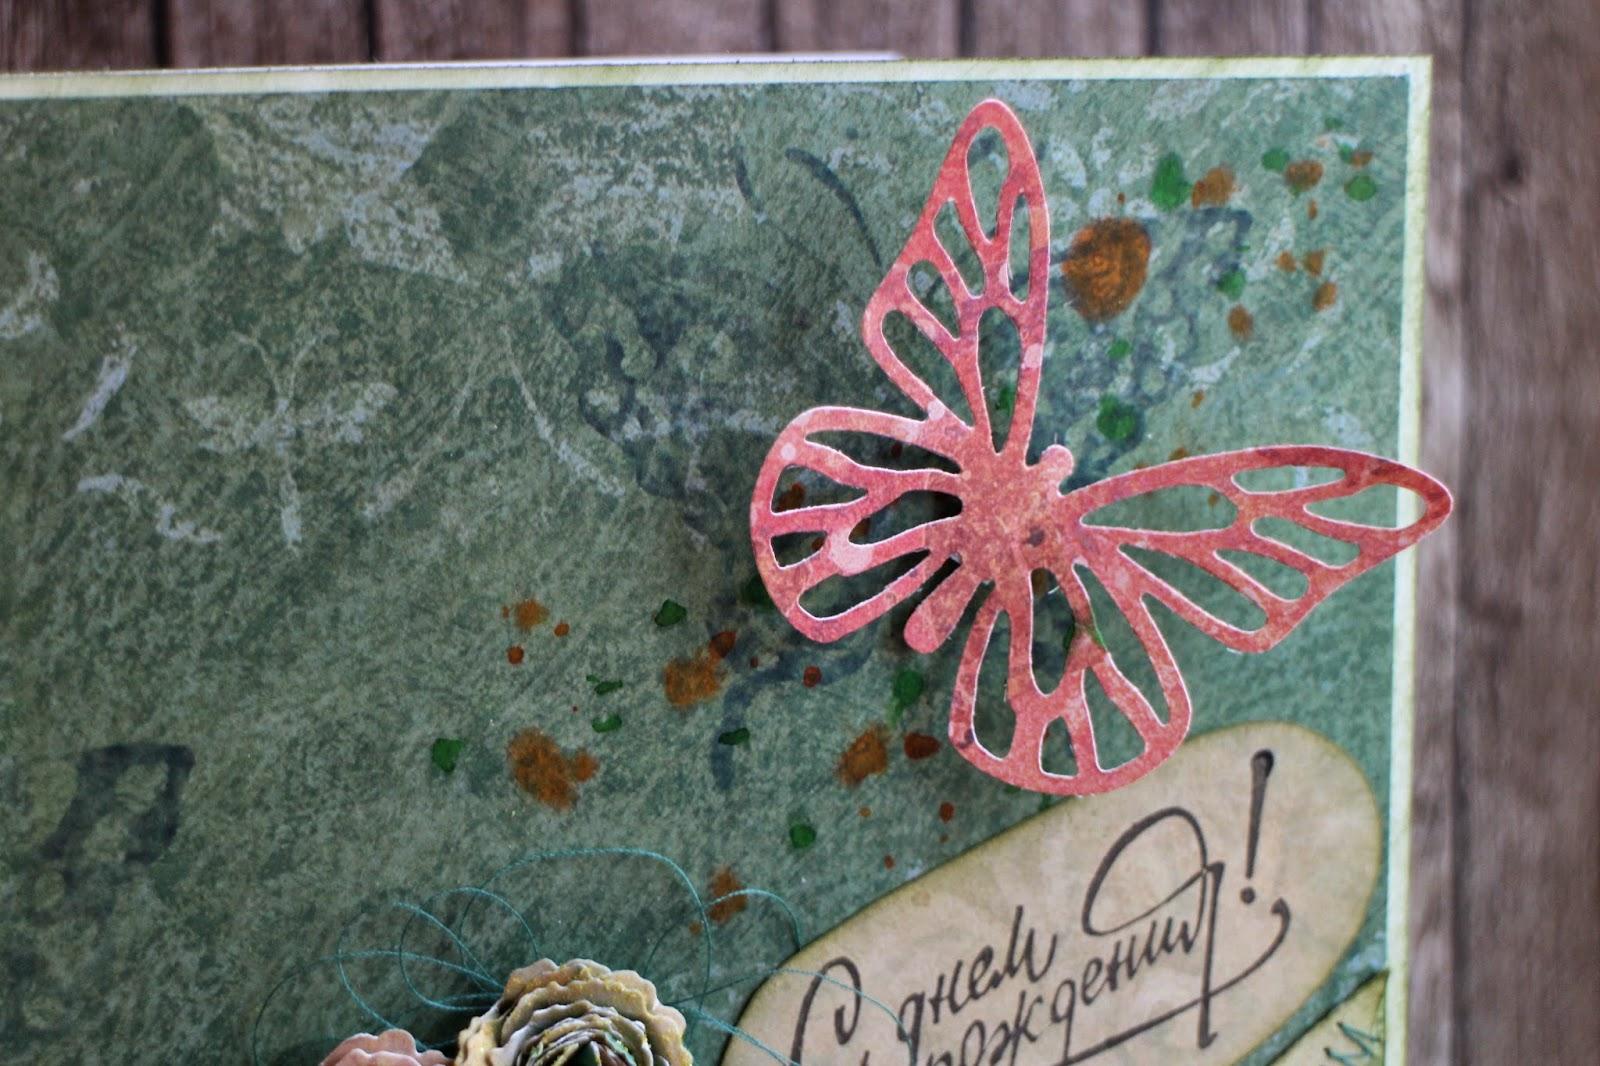 scrapbooking card birthday flower butterfly скрапбукинг открытка цвветы объёмные бабочка день рождения hamster-sensey